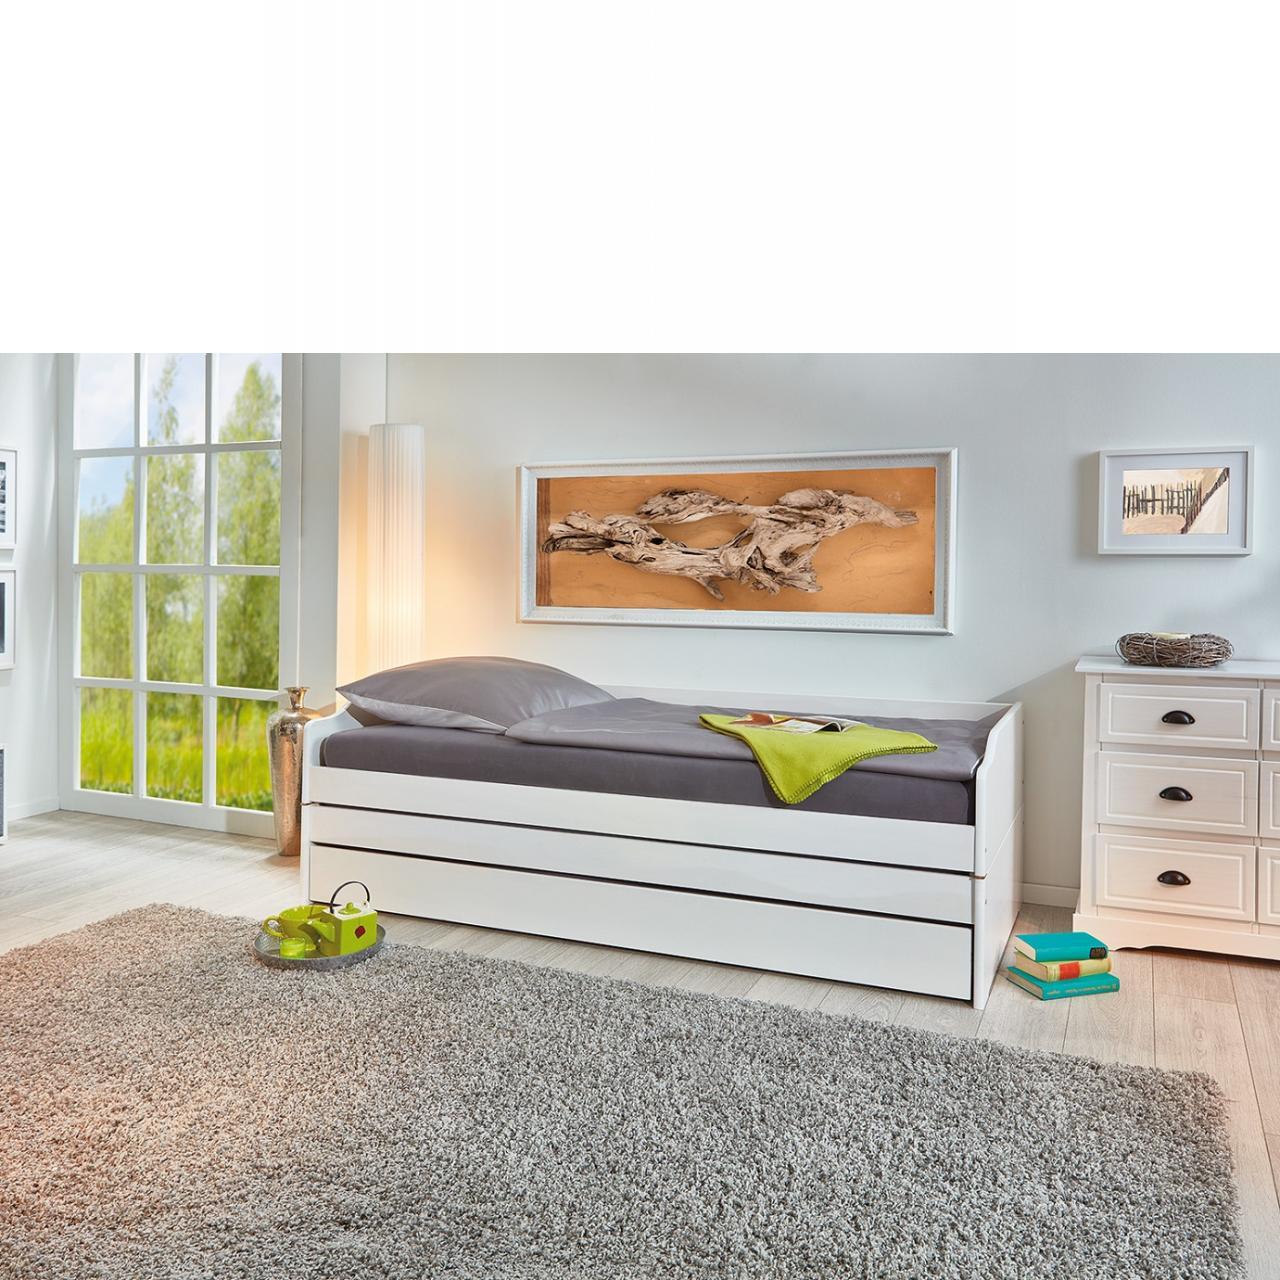 Funktionsbett Lotar 90x200 Gästebett Kinderbett Jugendbett Weiß Kiefer Massiv Drei Schlafmöglichkeit